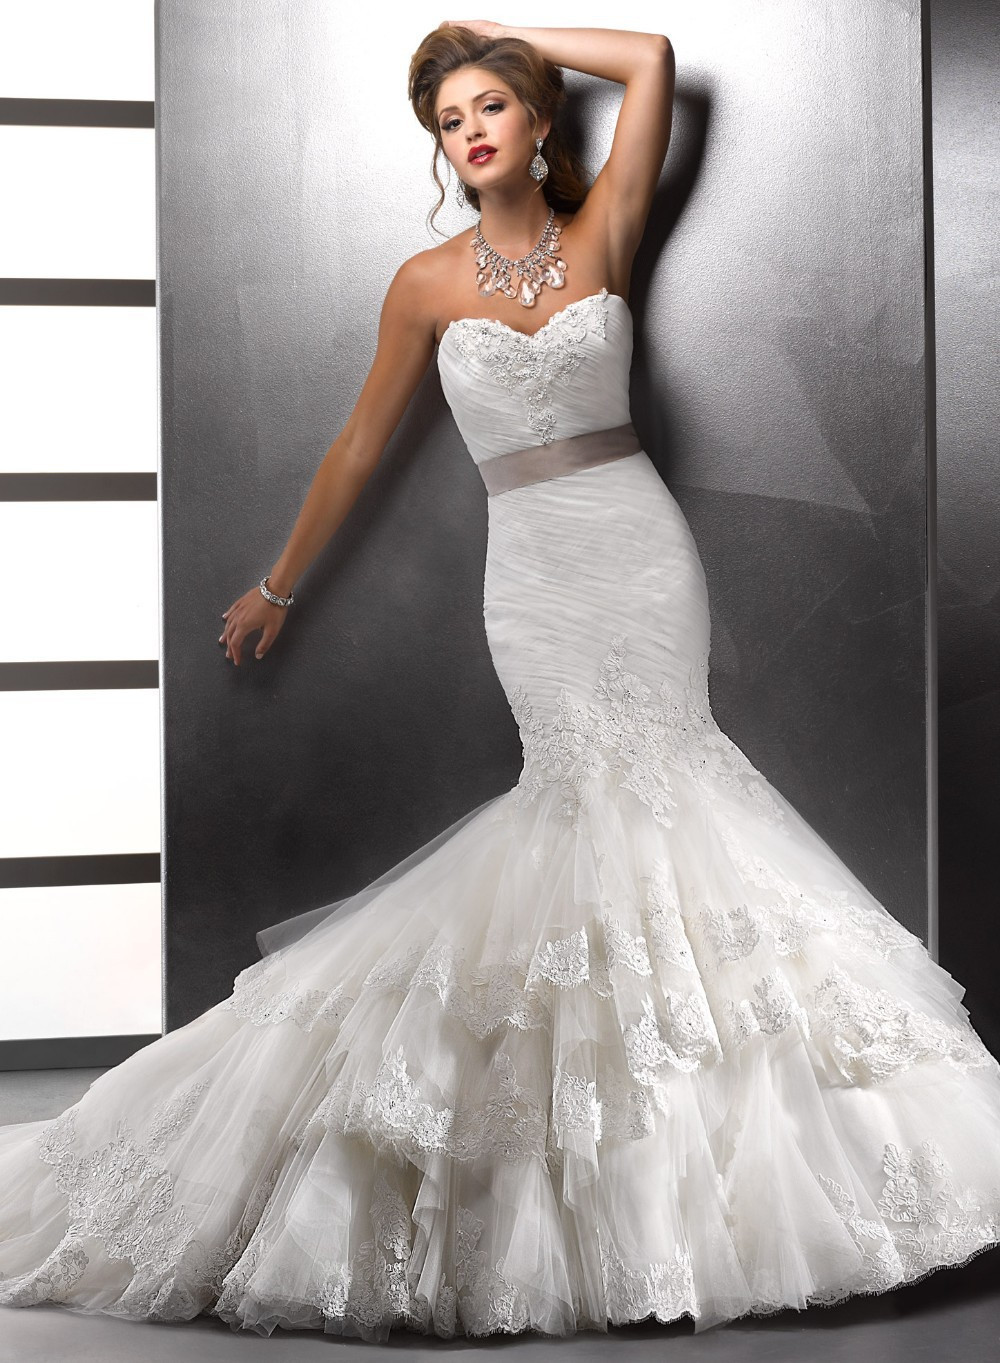 Panina Wedding Dress Prices | Wedding Dress Ideas